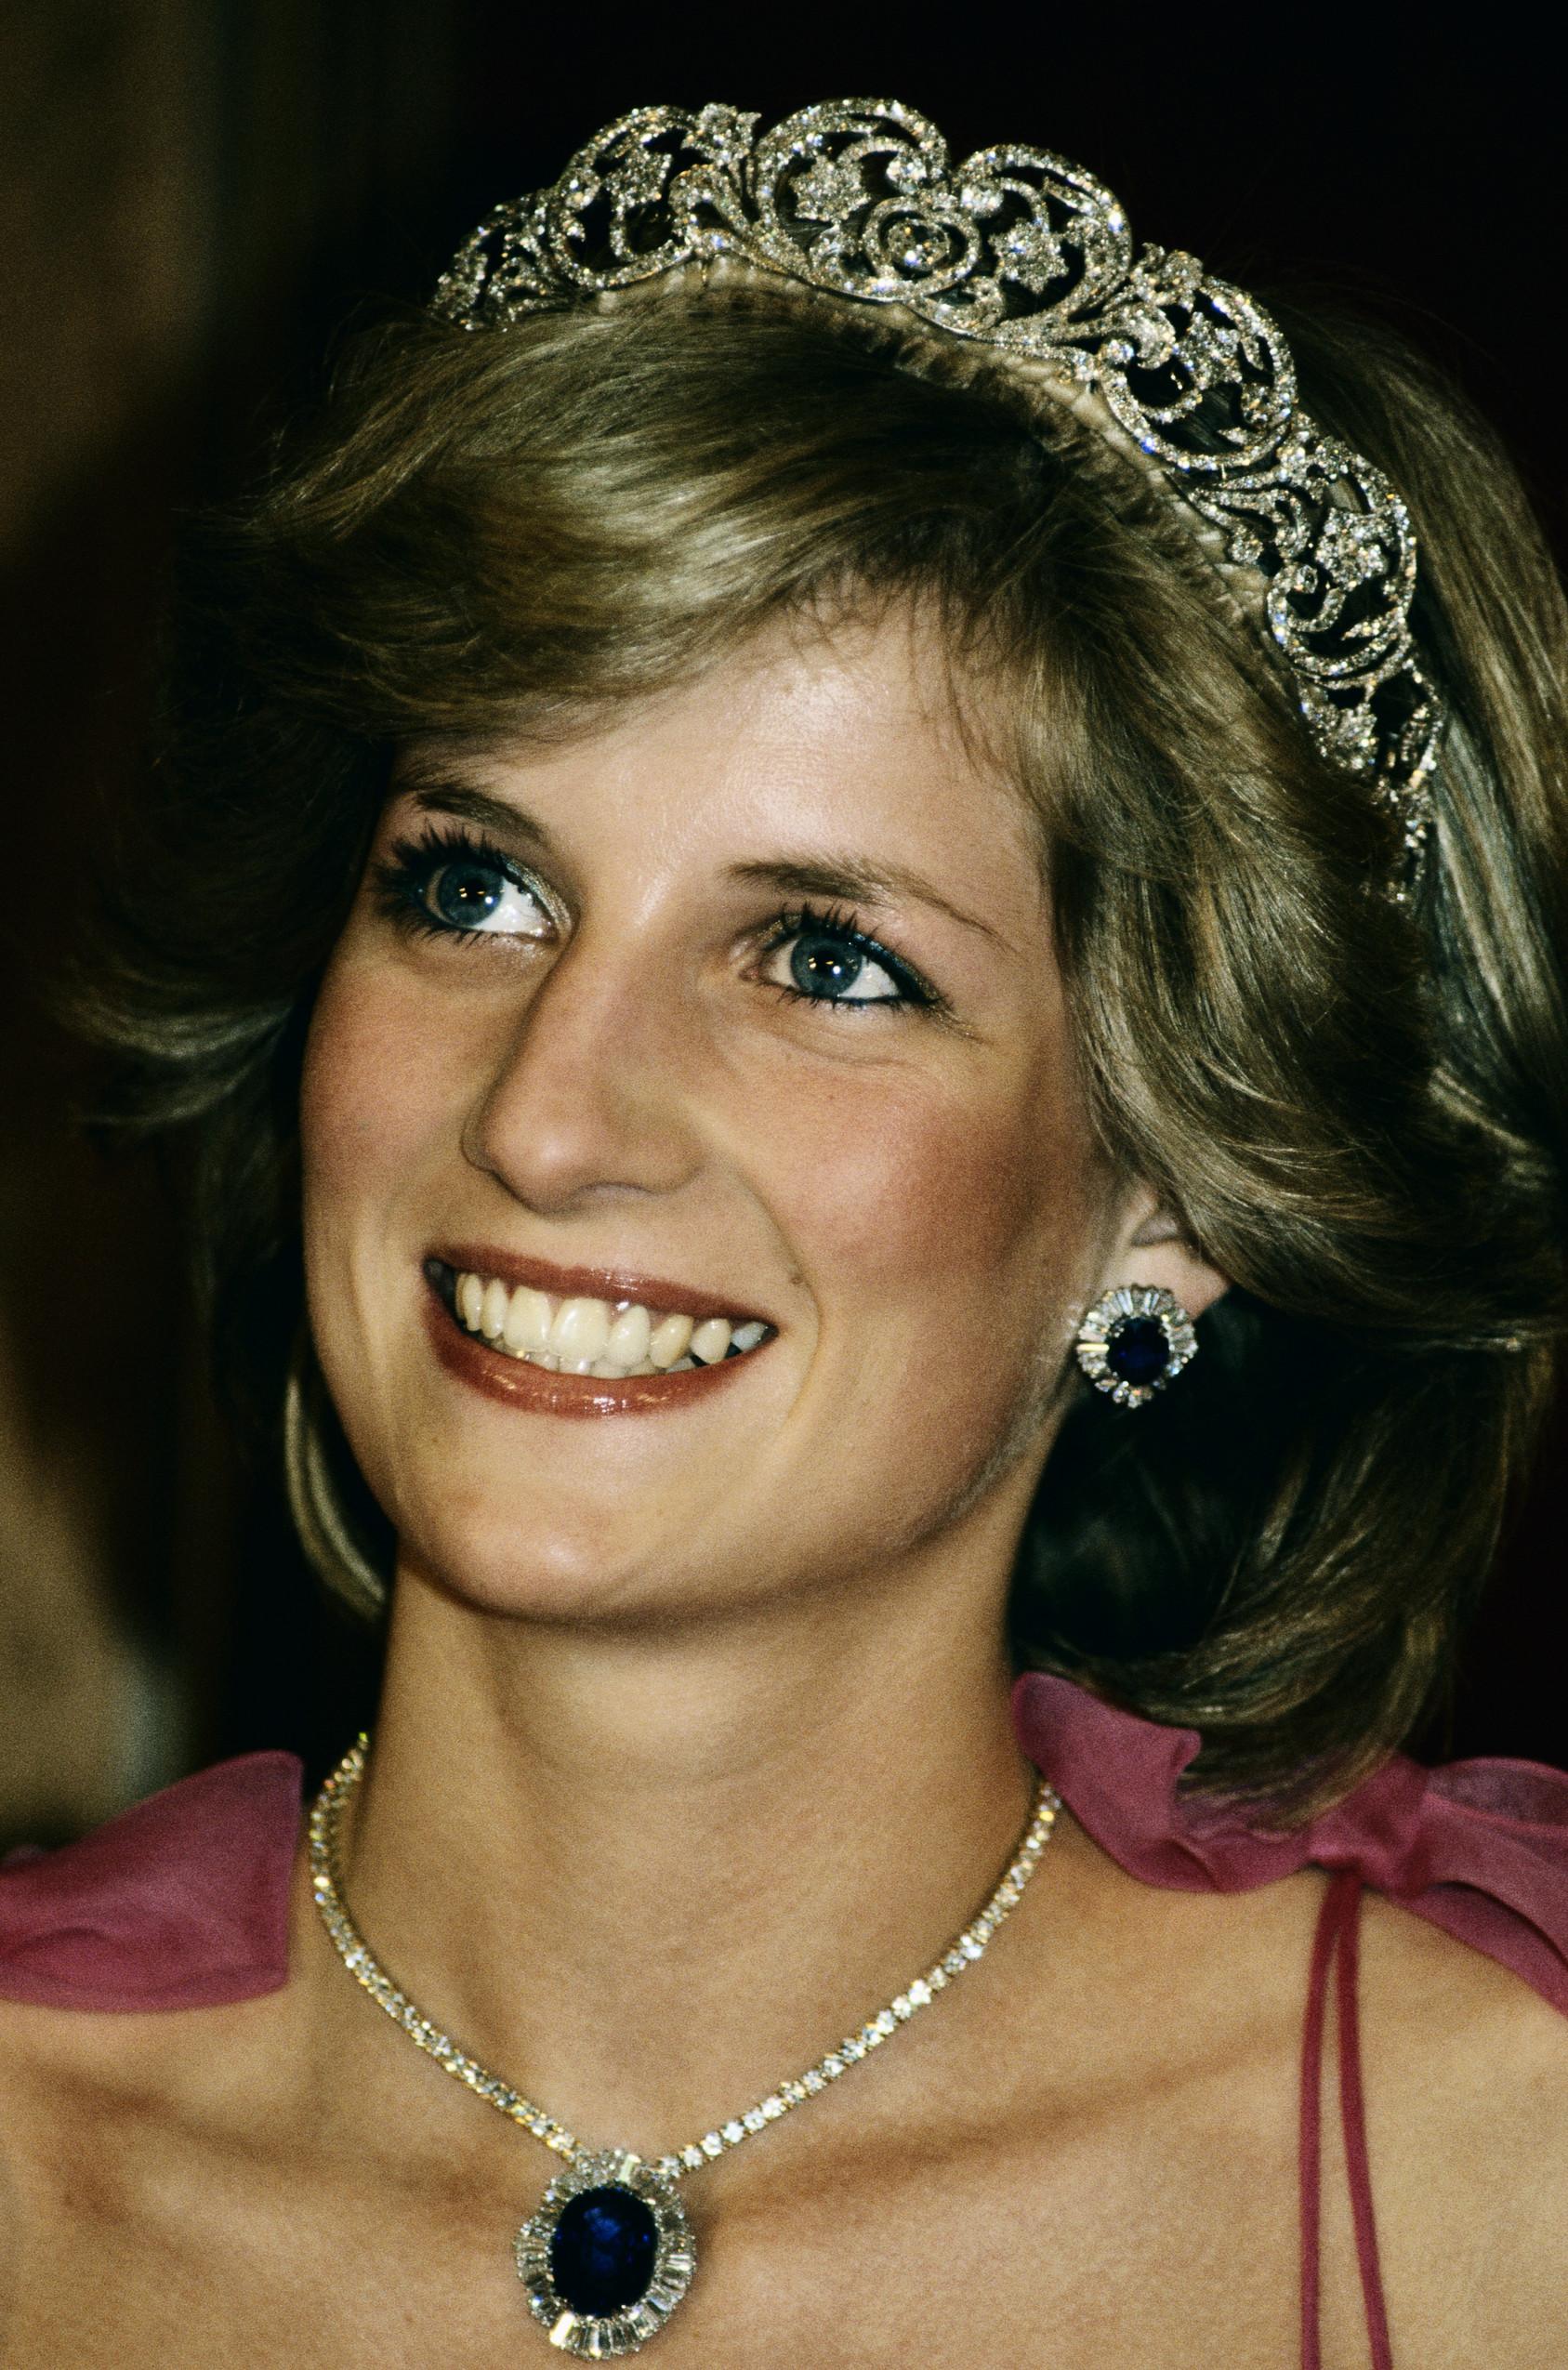 Princess Diana News Blog: Princess Diana Kosty 555 Info 151 (Princess Diana Kosty555